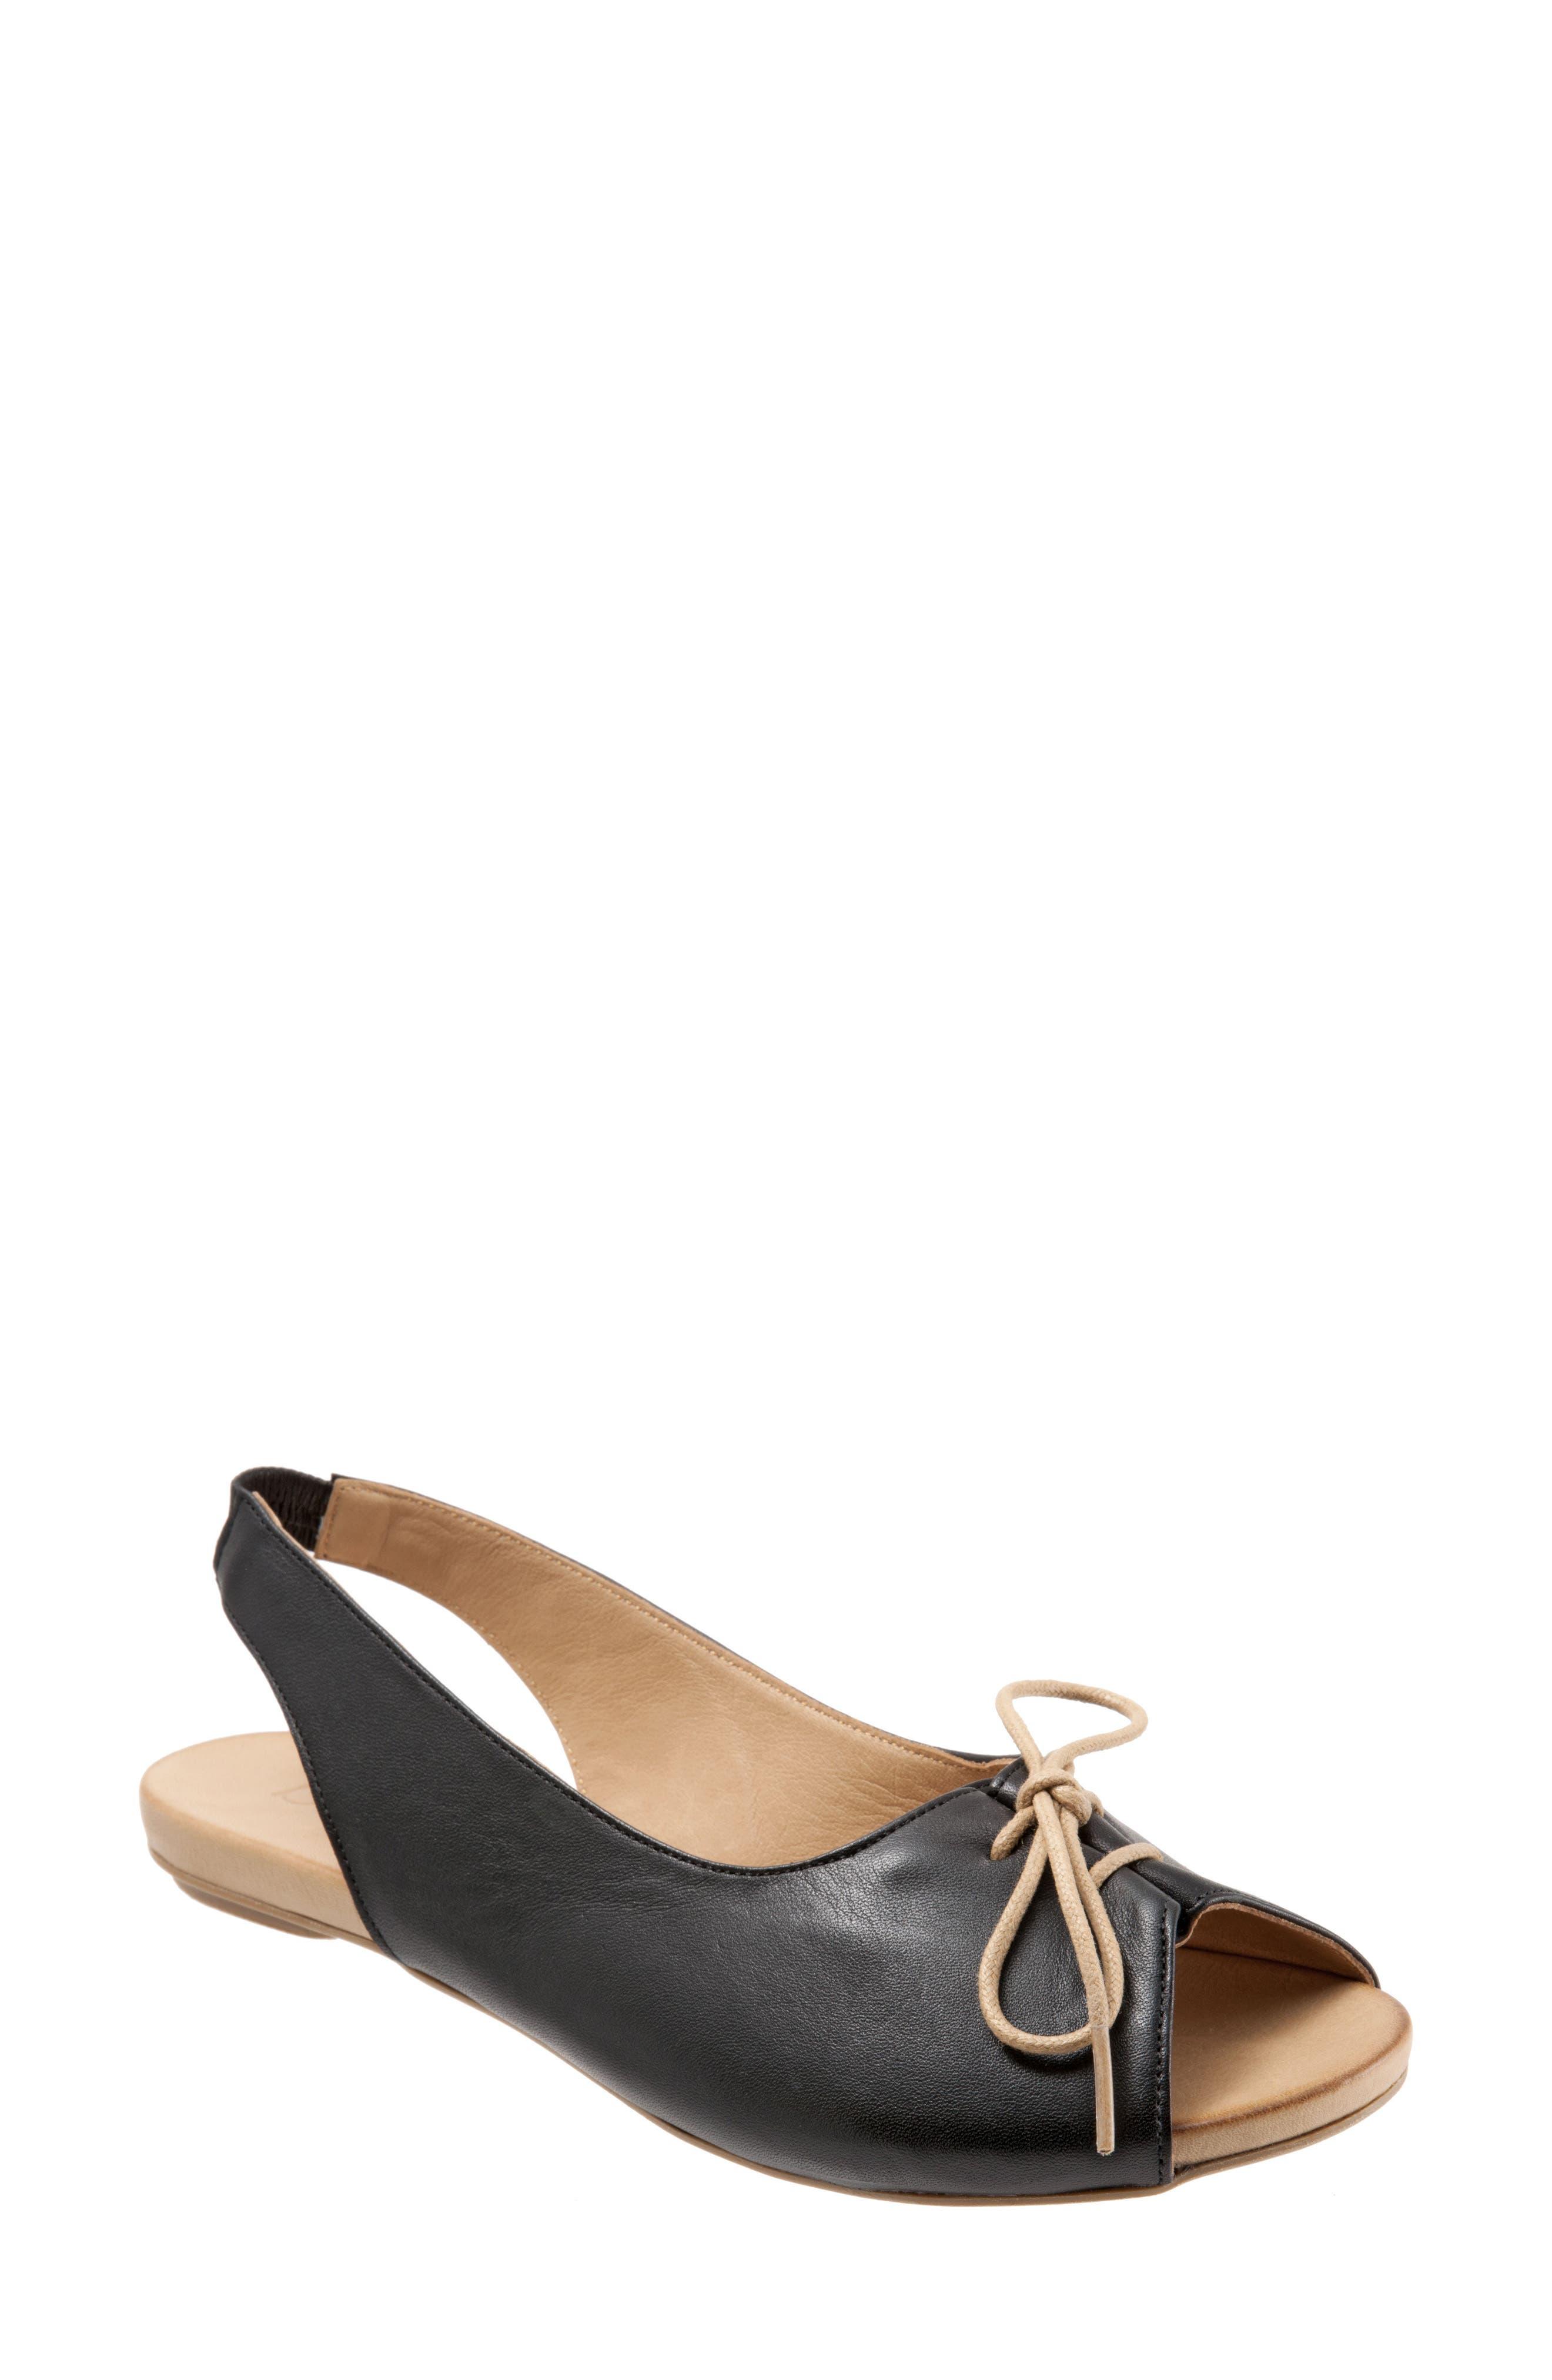 Keely Slingback Tie Sandal,                         Main,                         color, BLACK LEATHER